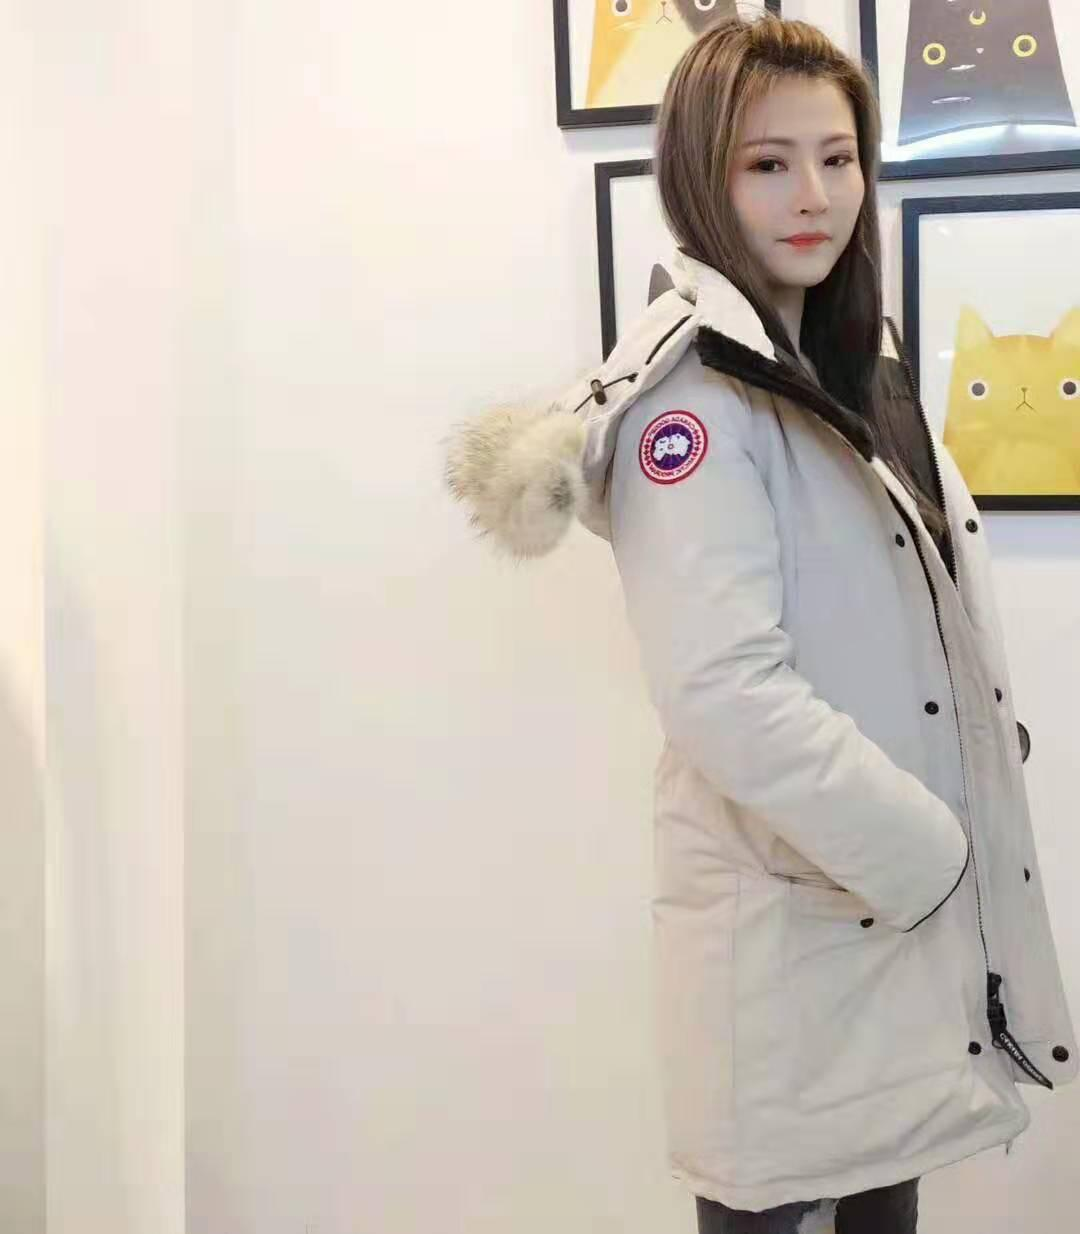 20 Jacket Parka Men Women Classic 007 Casual Down Jacket Coats Mens Outdoor Warm Feather Winter Jacket Unisex Coat Outwear